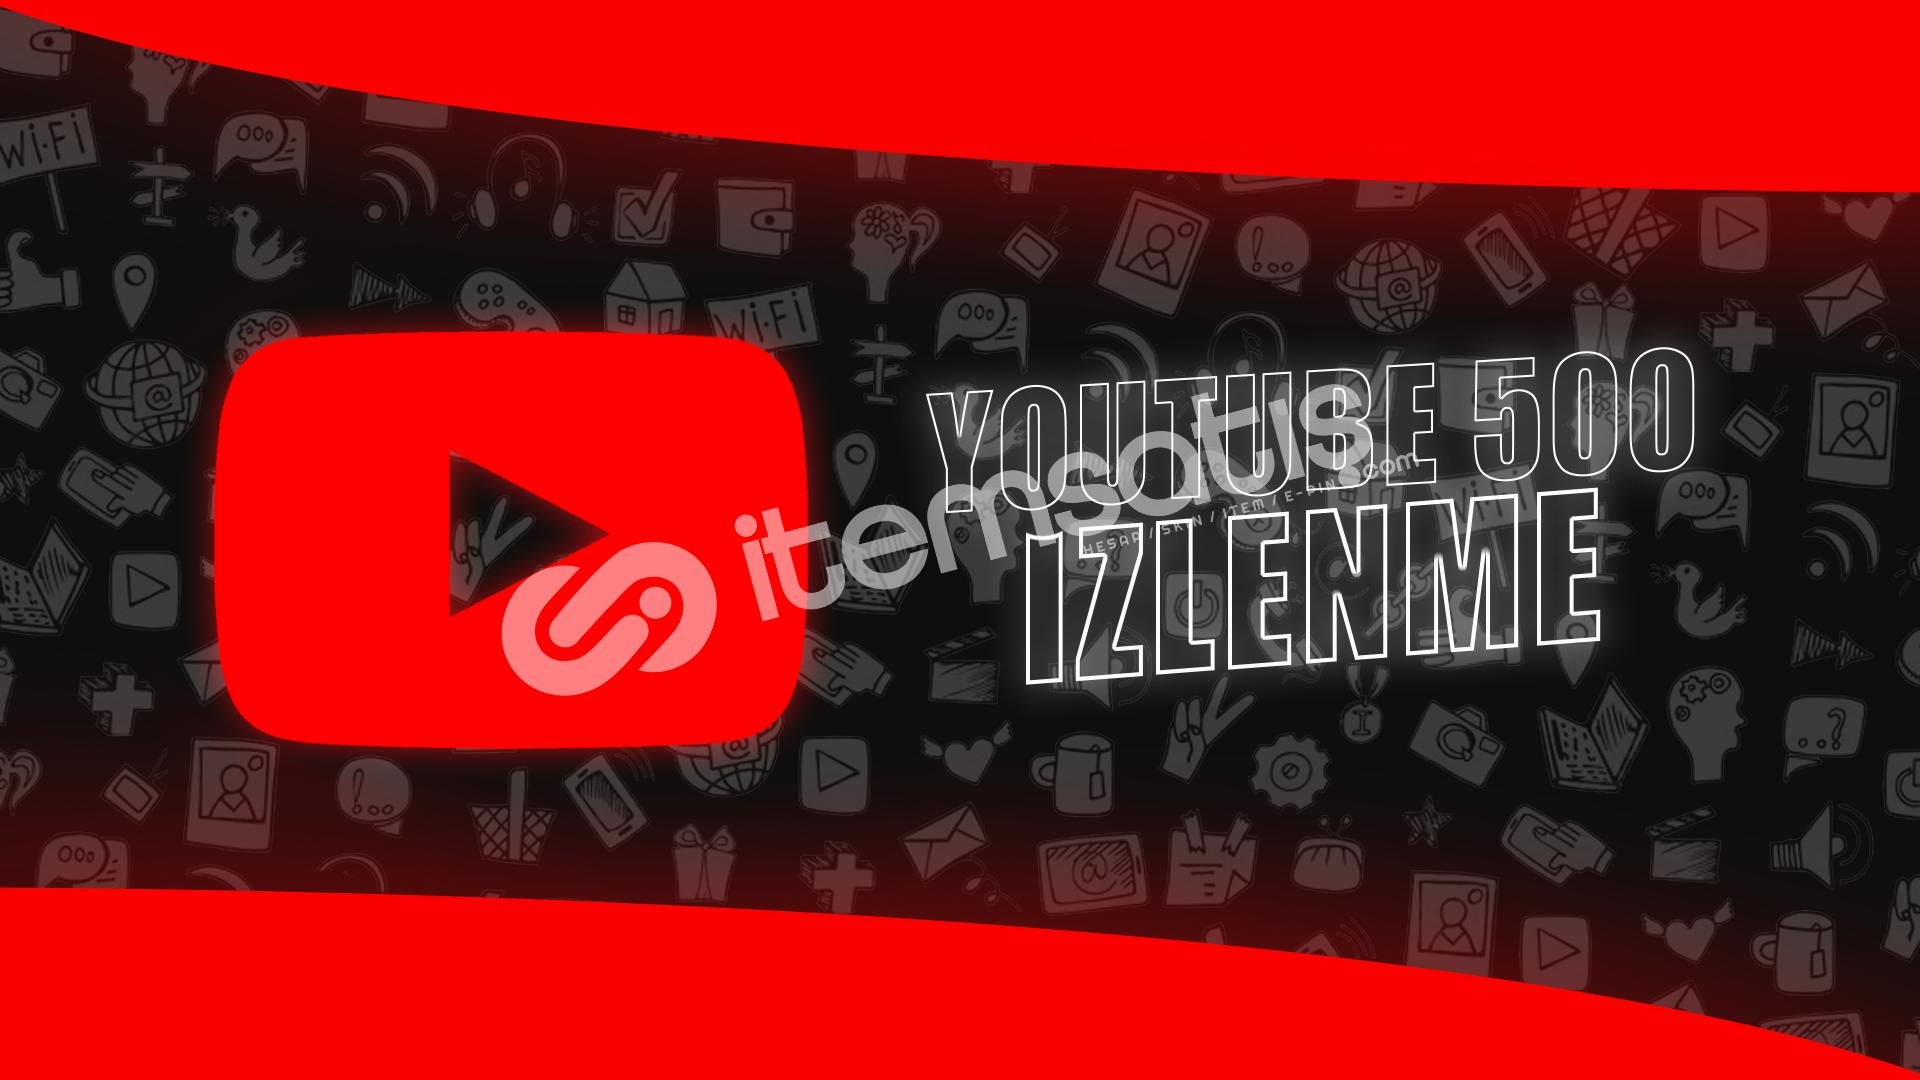 Çalışan Tek Servis! - YouTube 500 İzlenme - 3TL